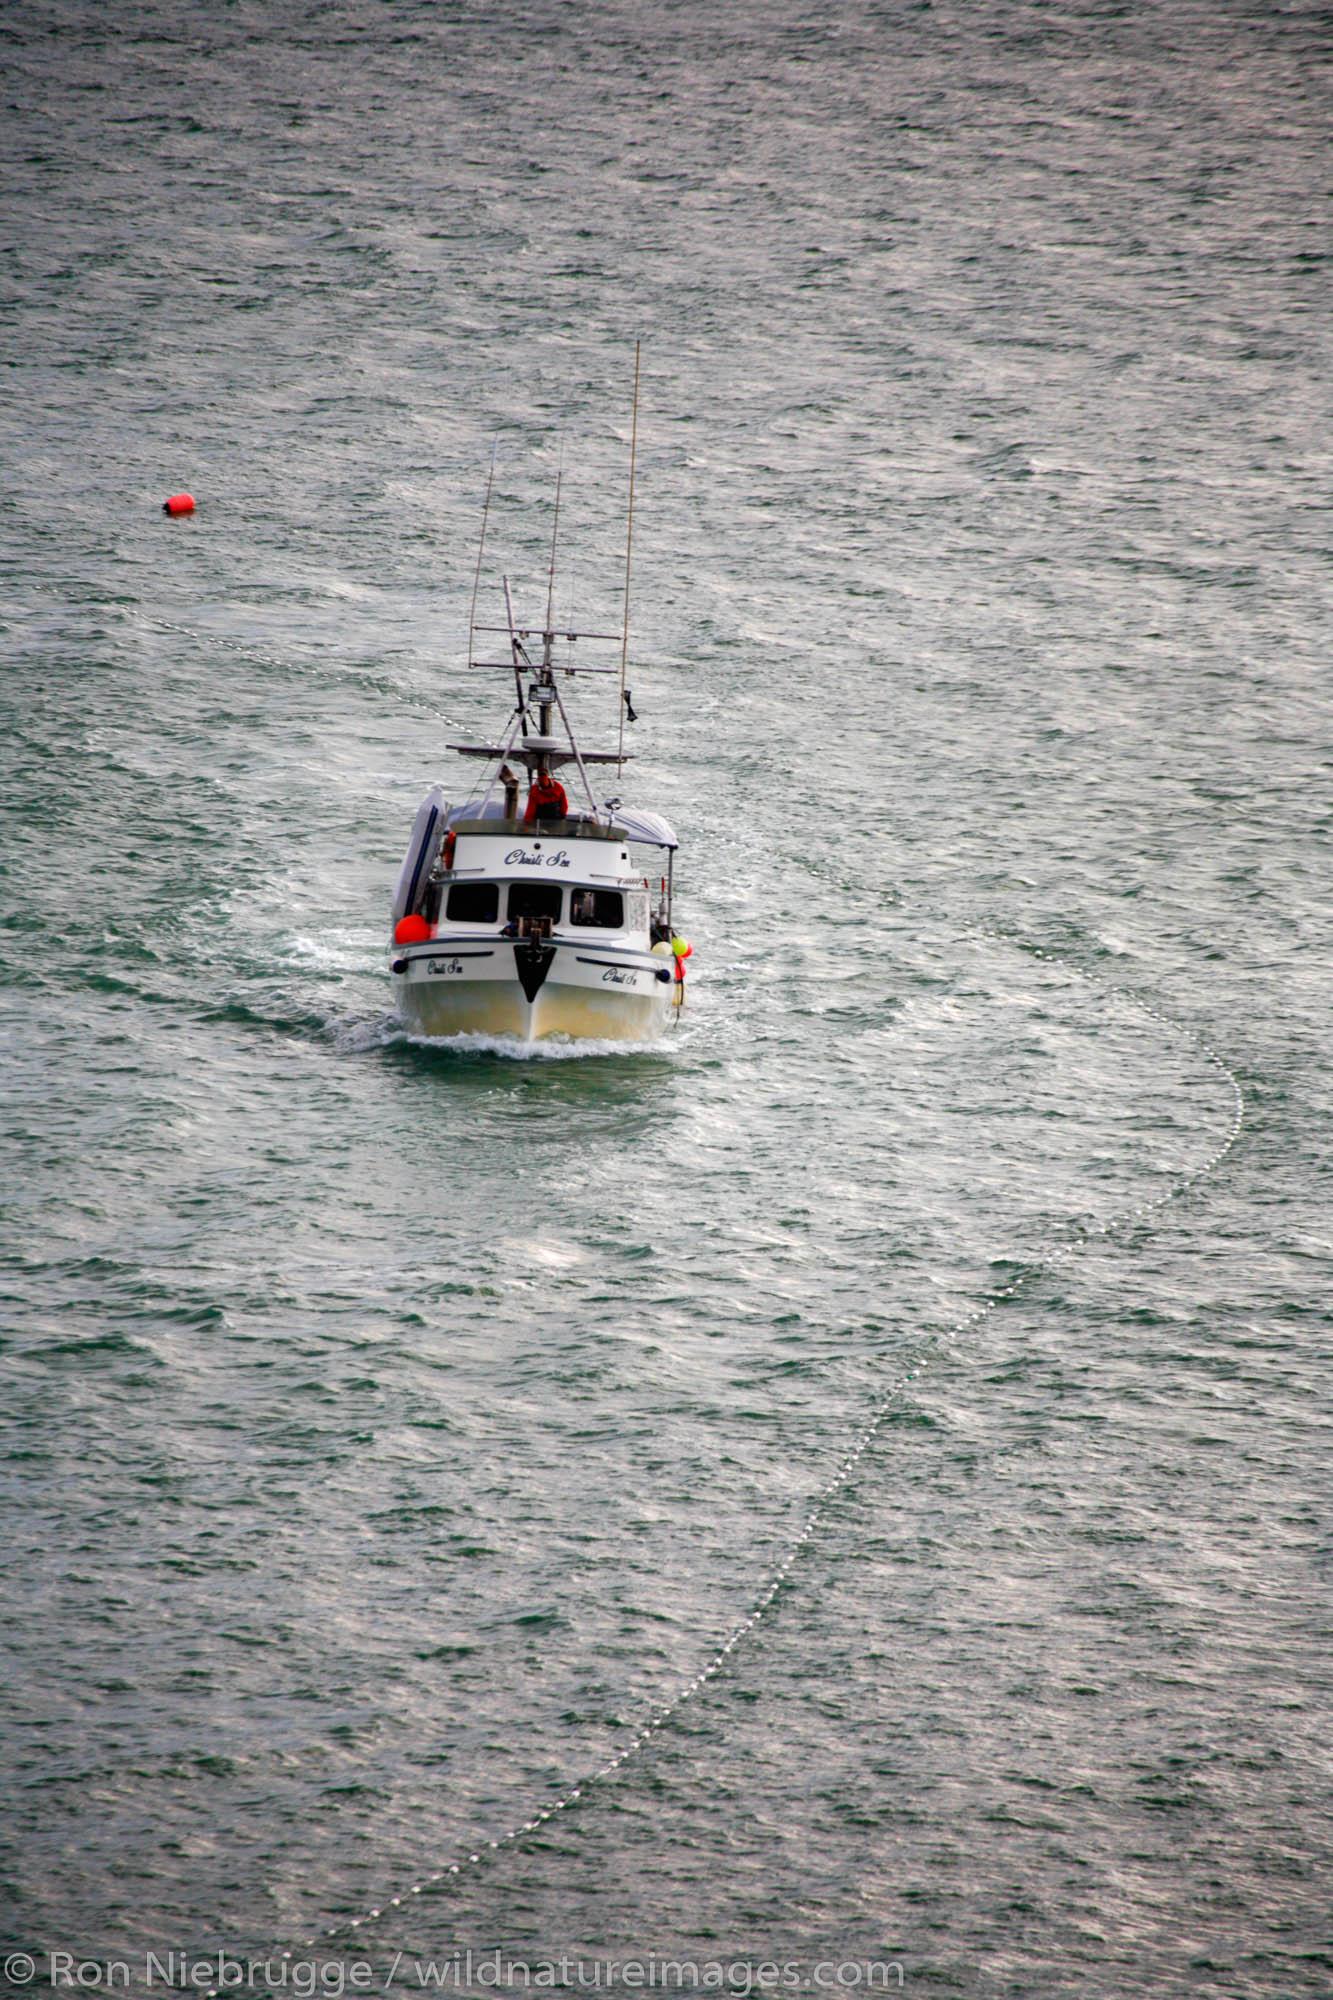 A fishing vessel in Lynn Canal, Juneau, Alaska.